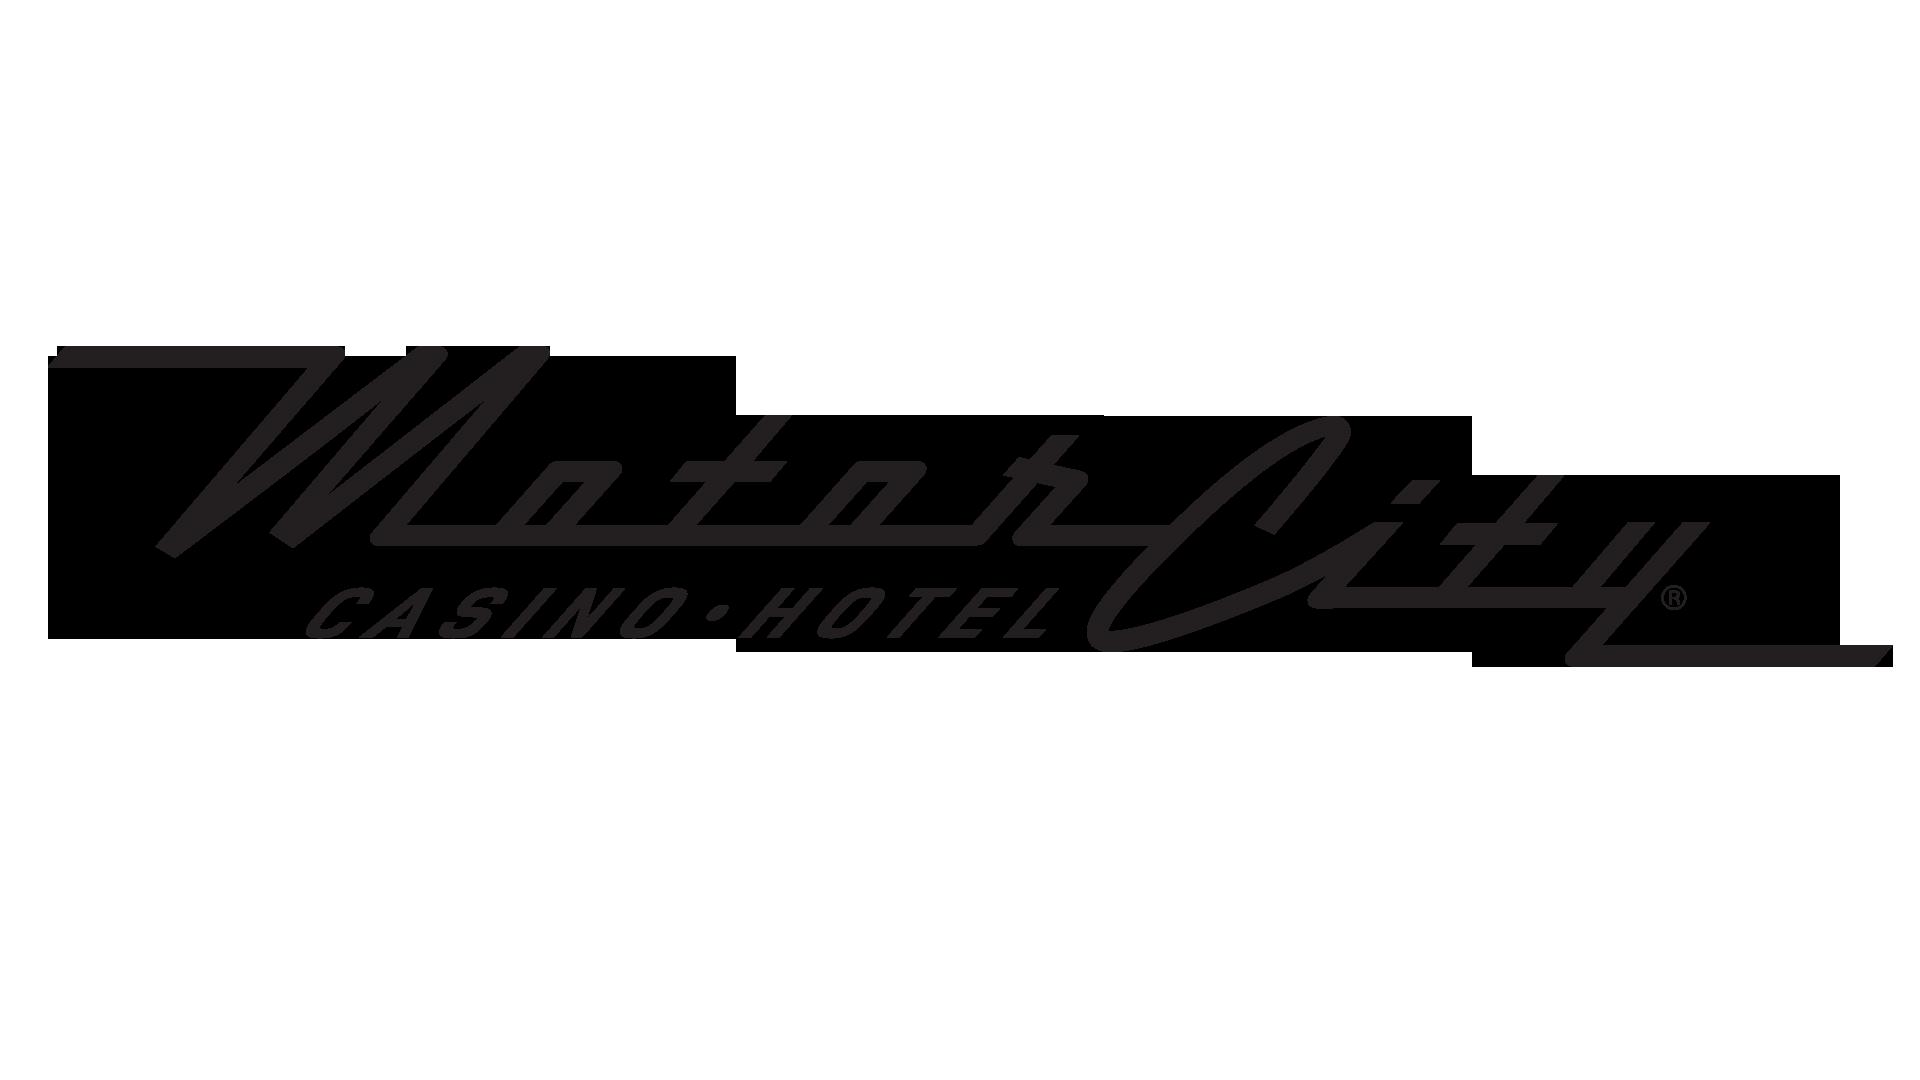 MotorCity Casino Hotel logo